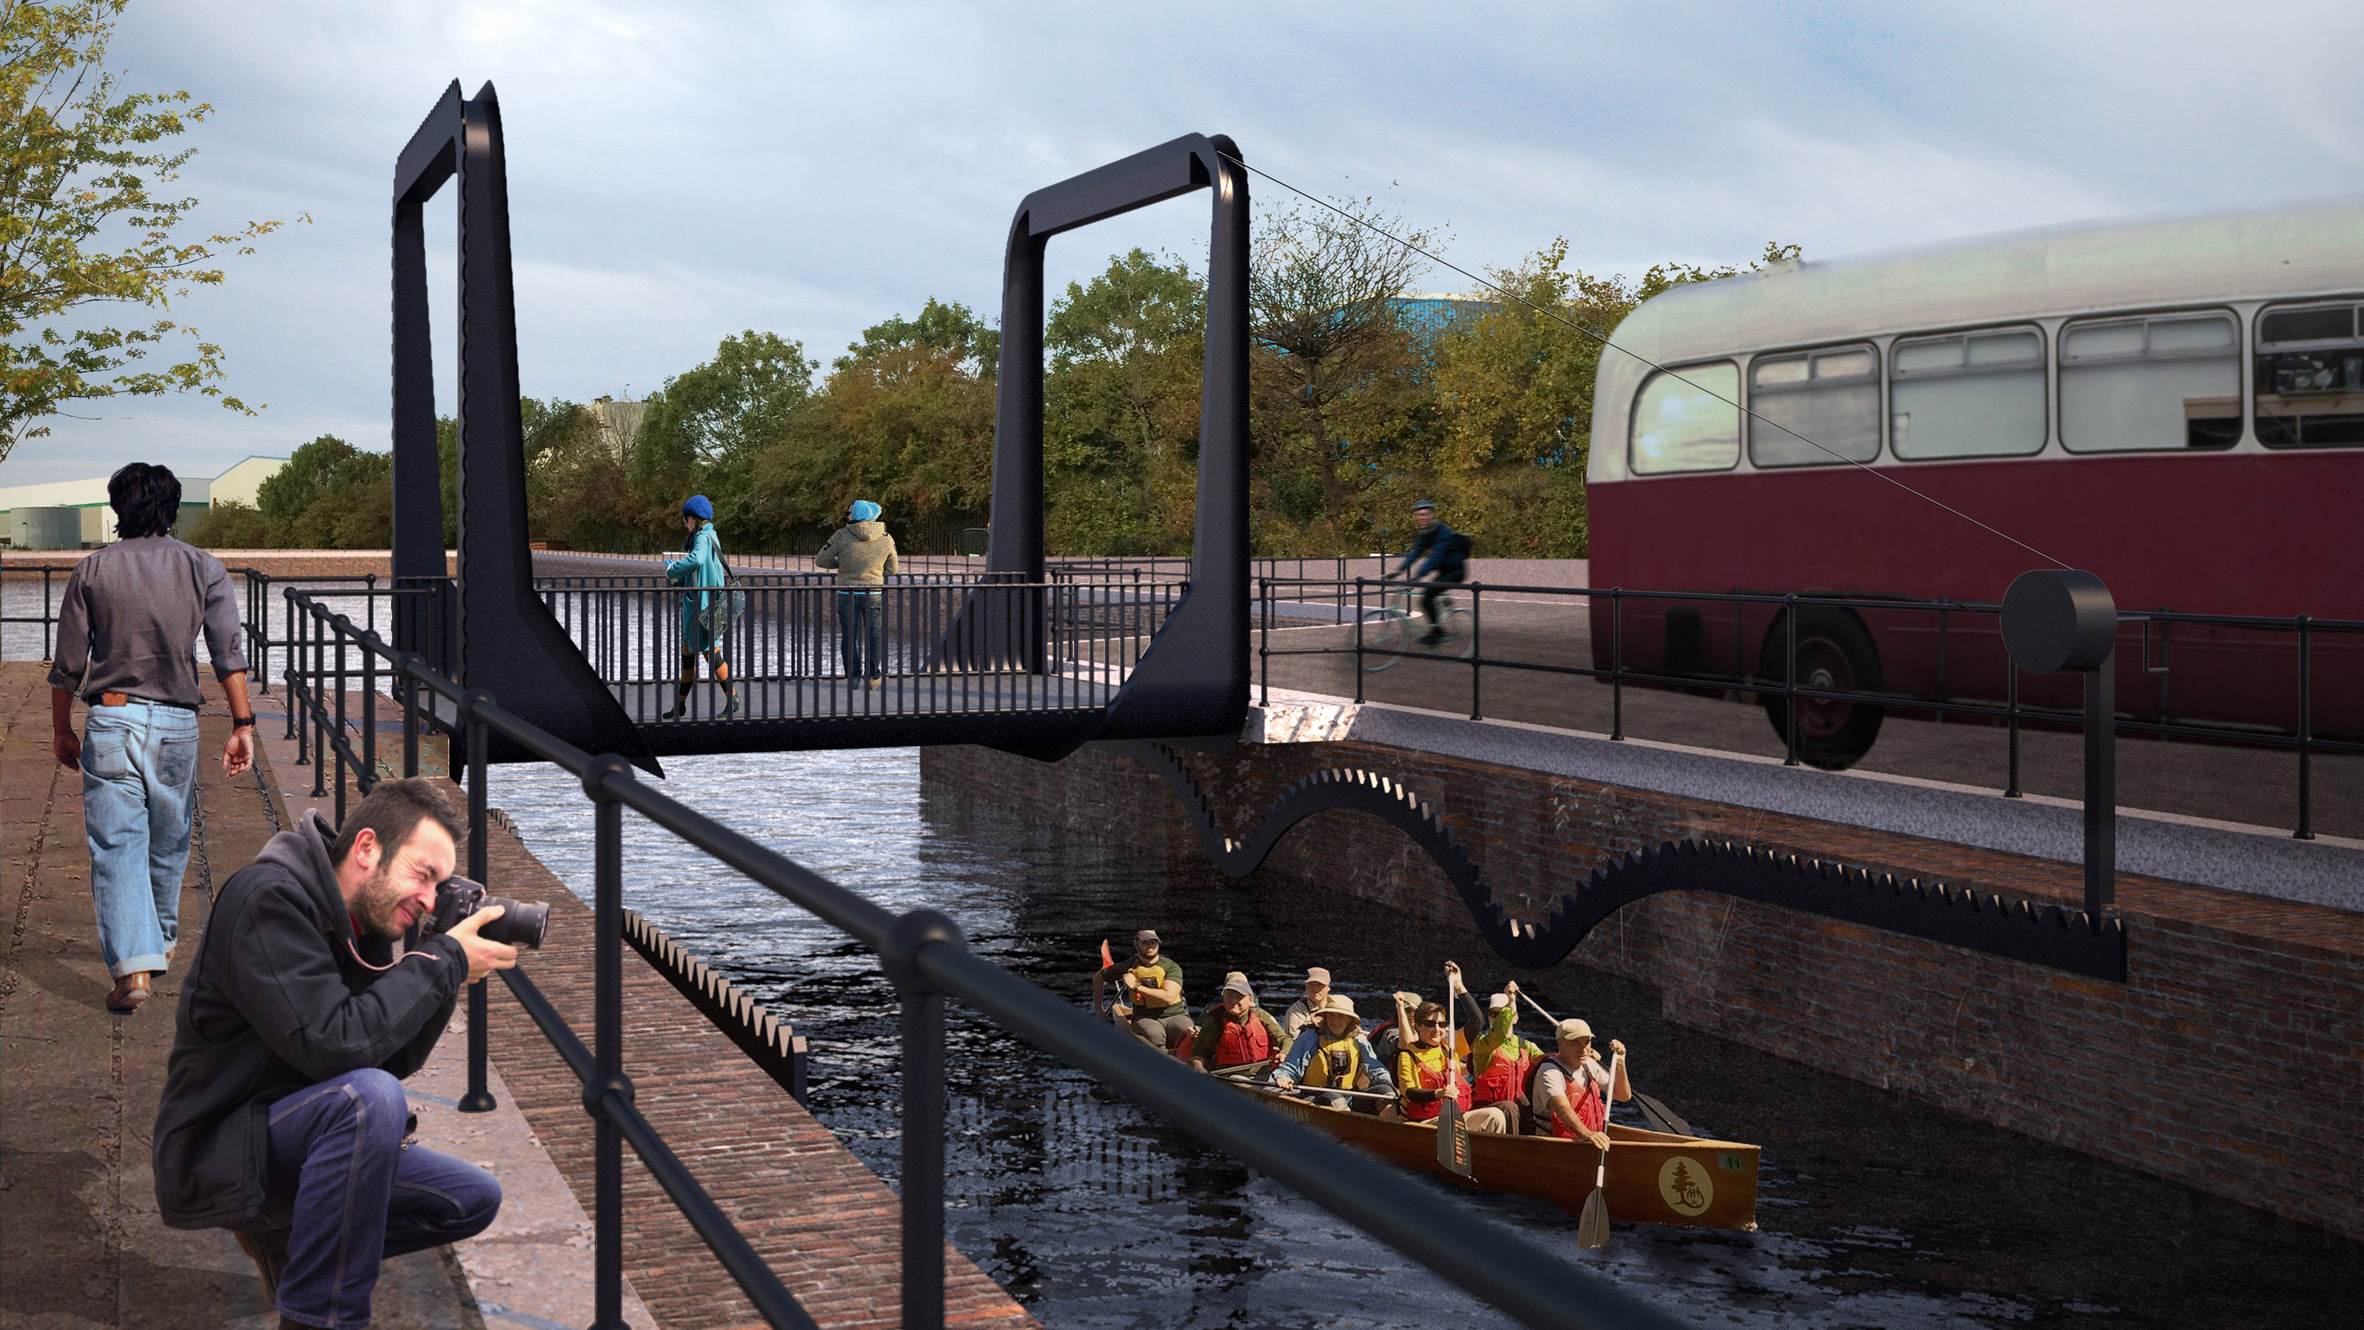 Designer proposes modern rolling bridge cranked by hand